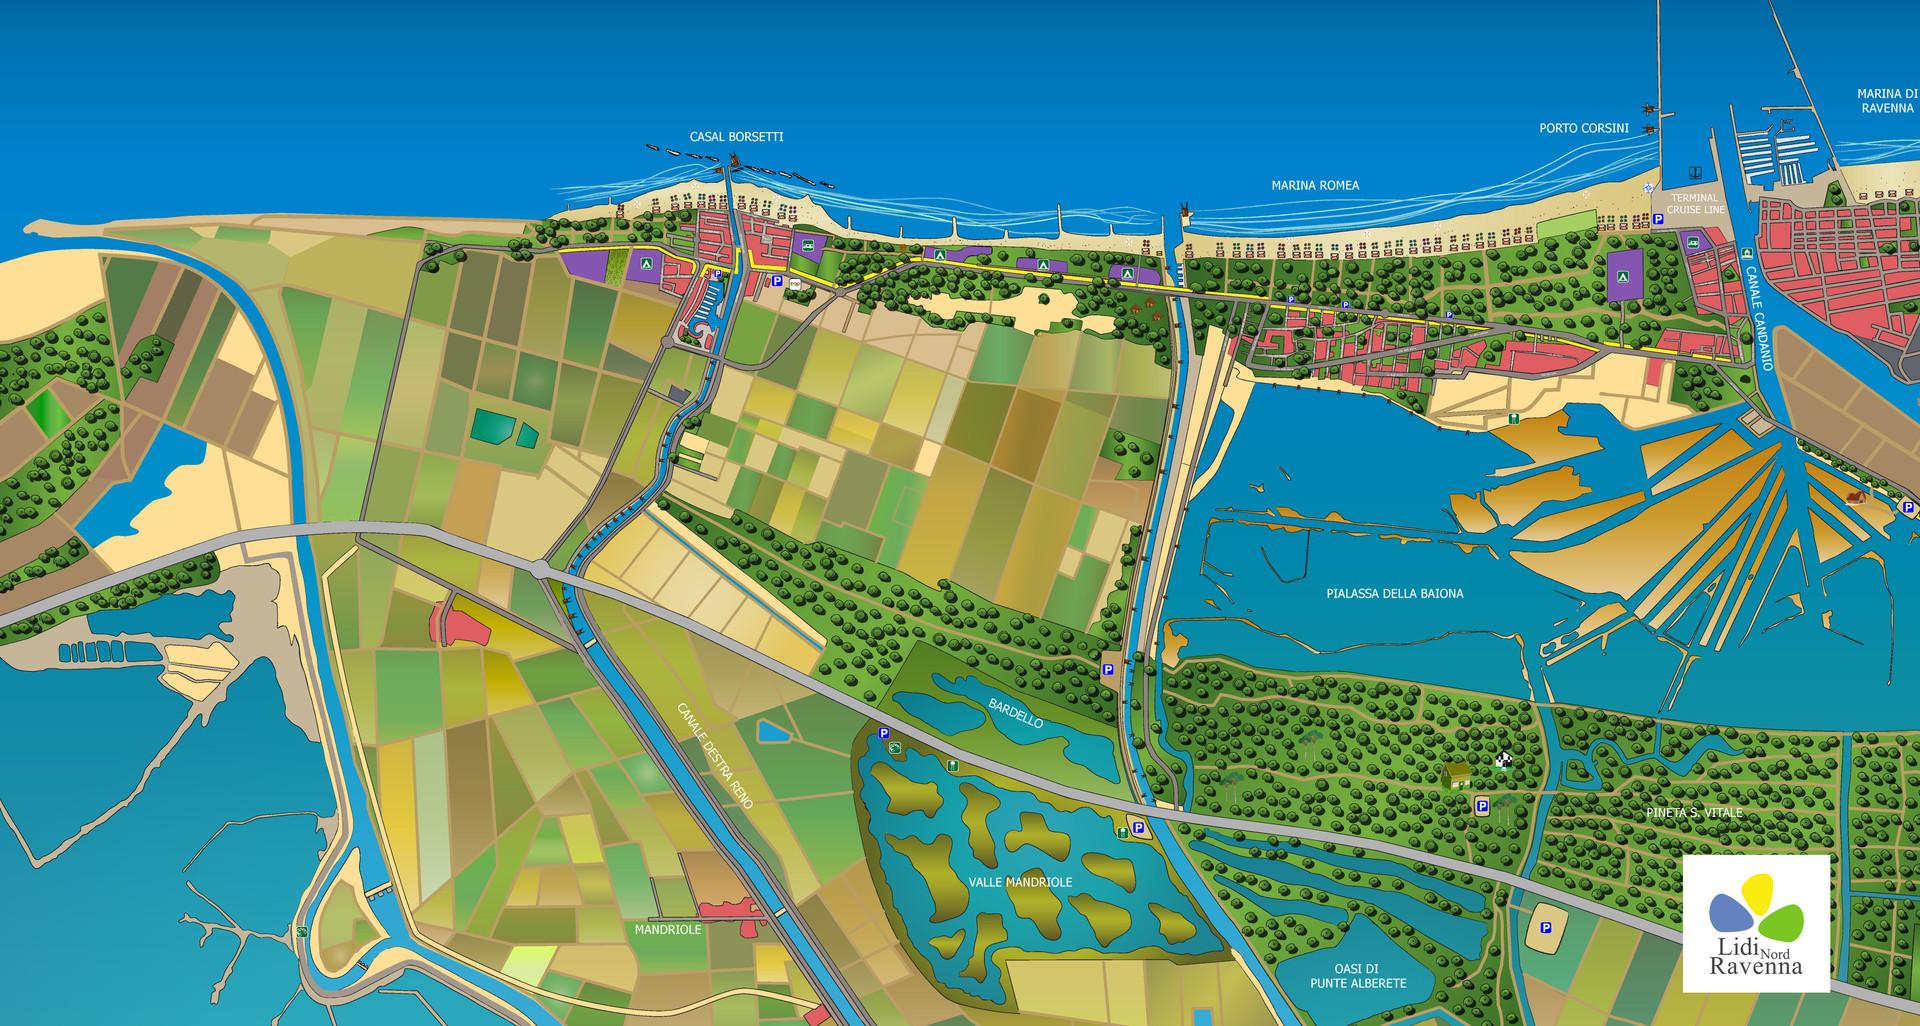 Mappa Lidi Nord Ravenna. Copyright